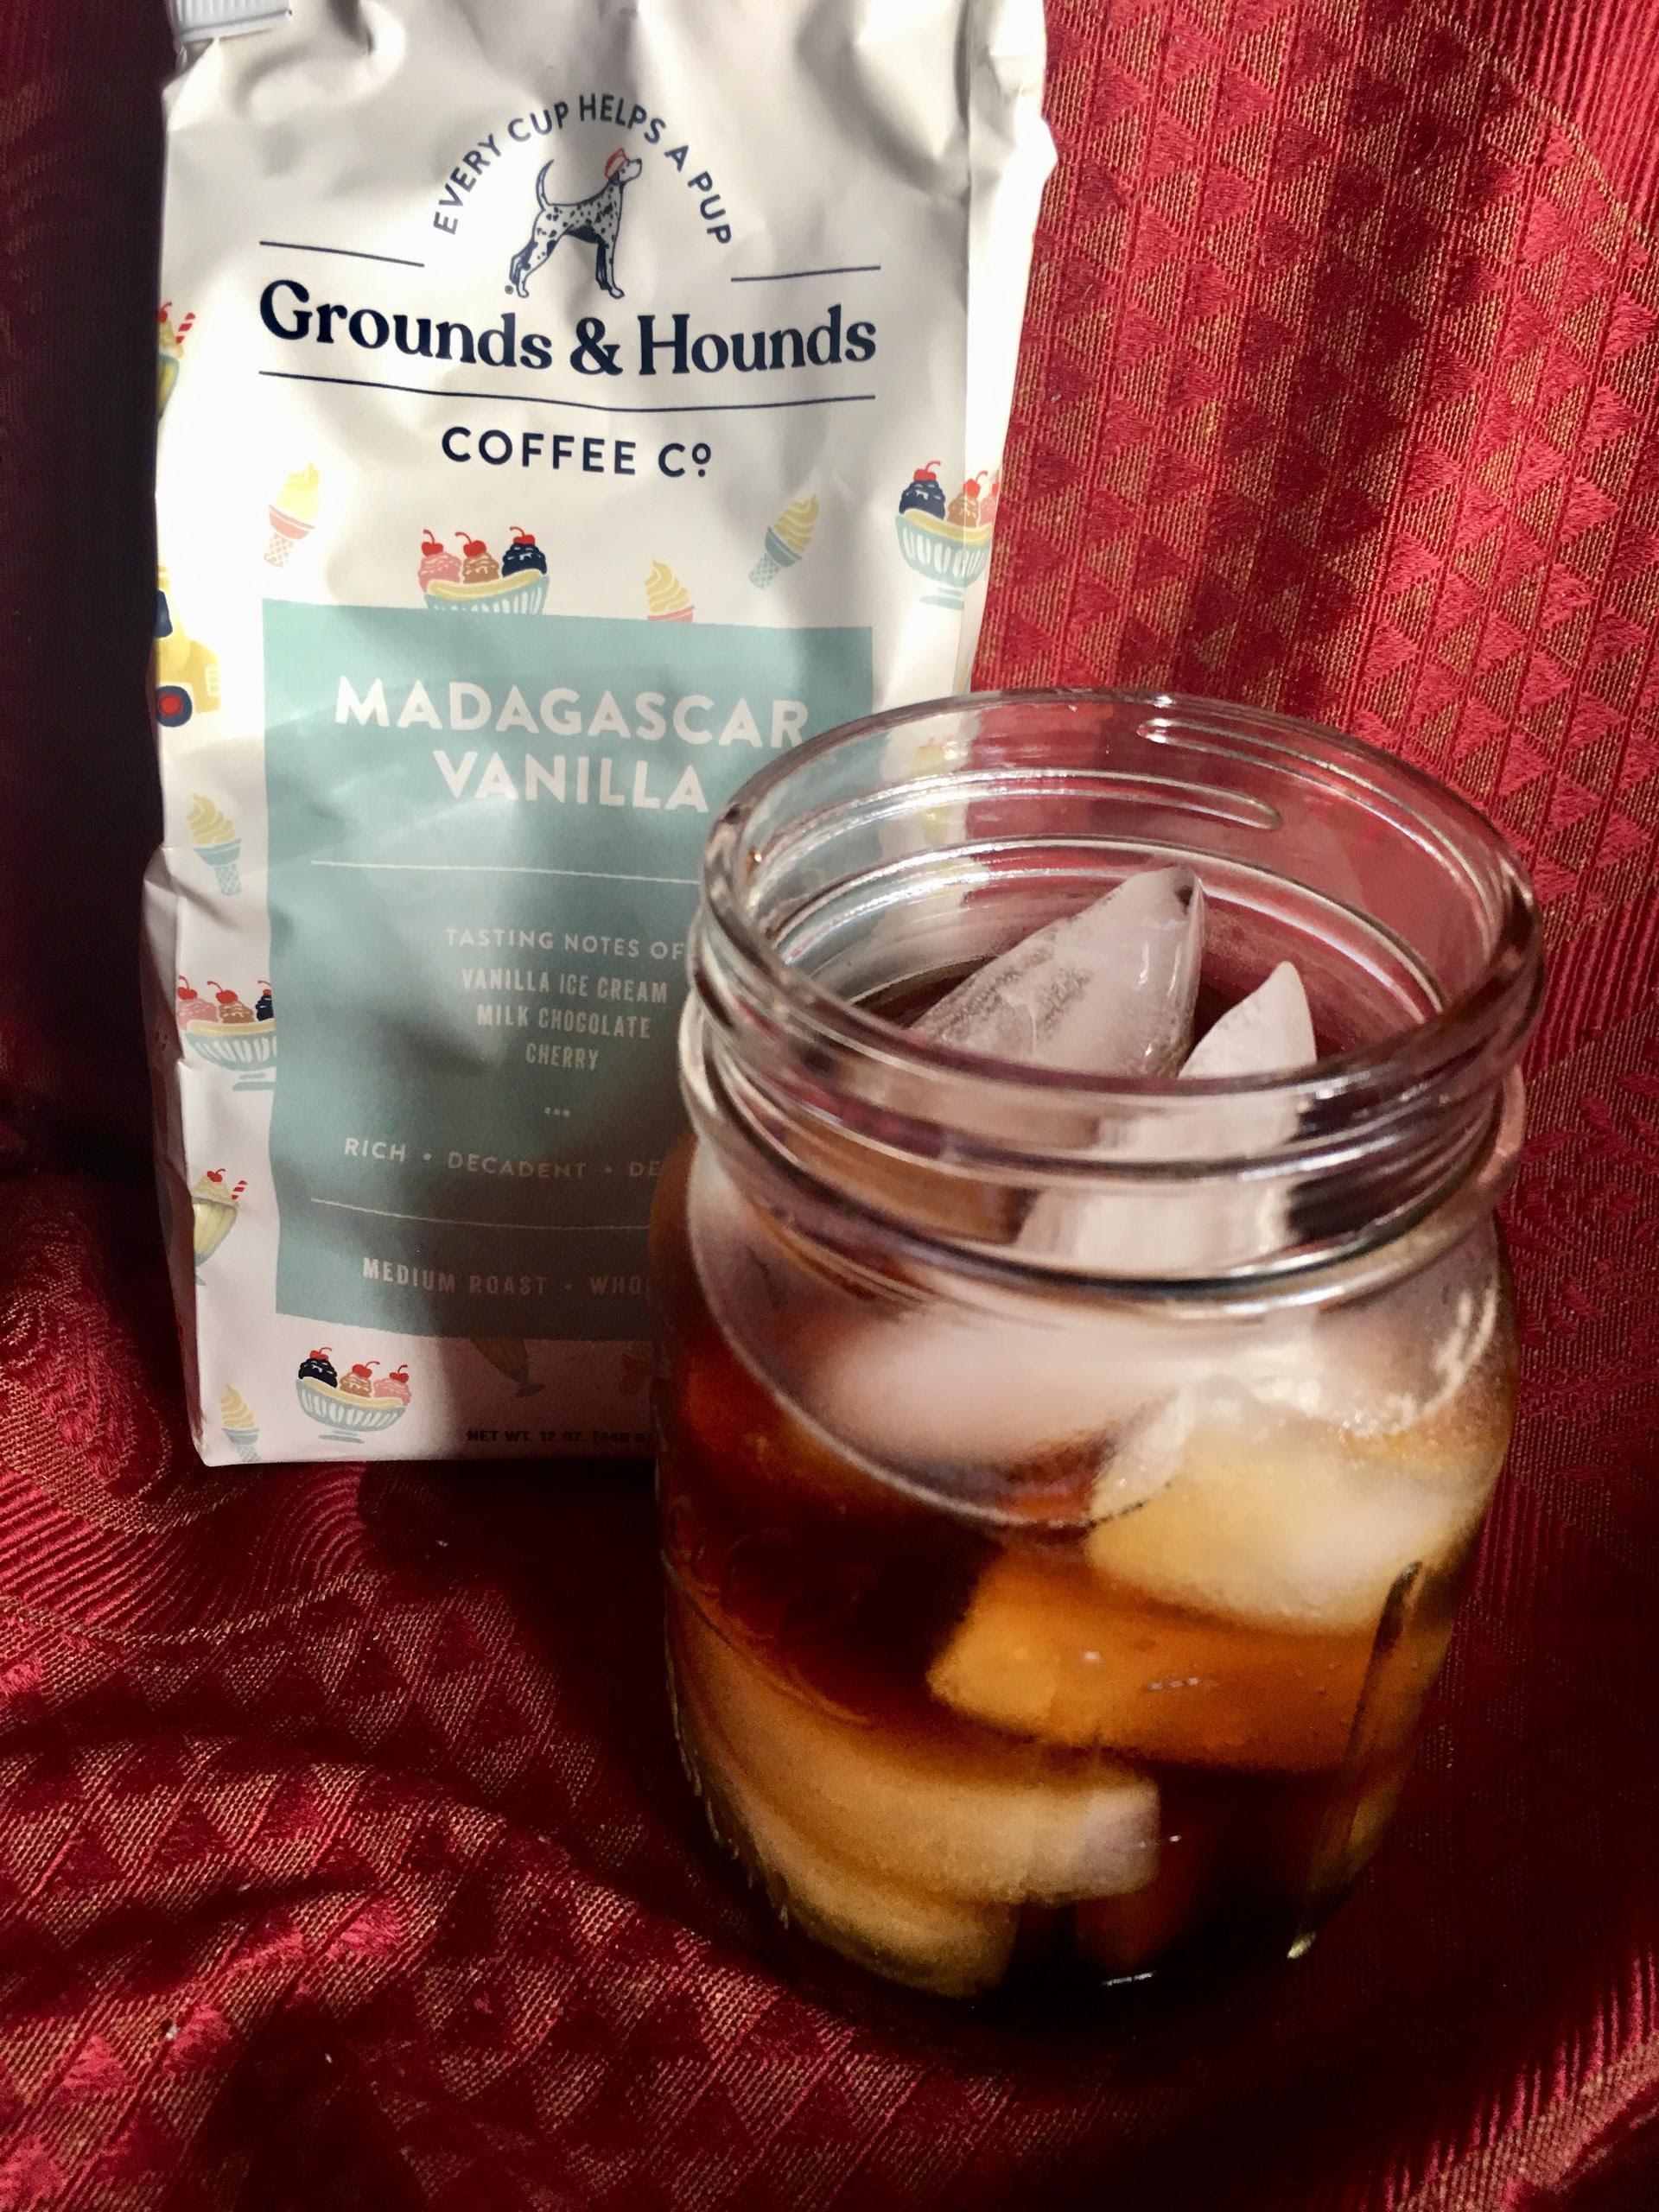 bag of coffee next to an iced coffee